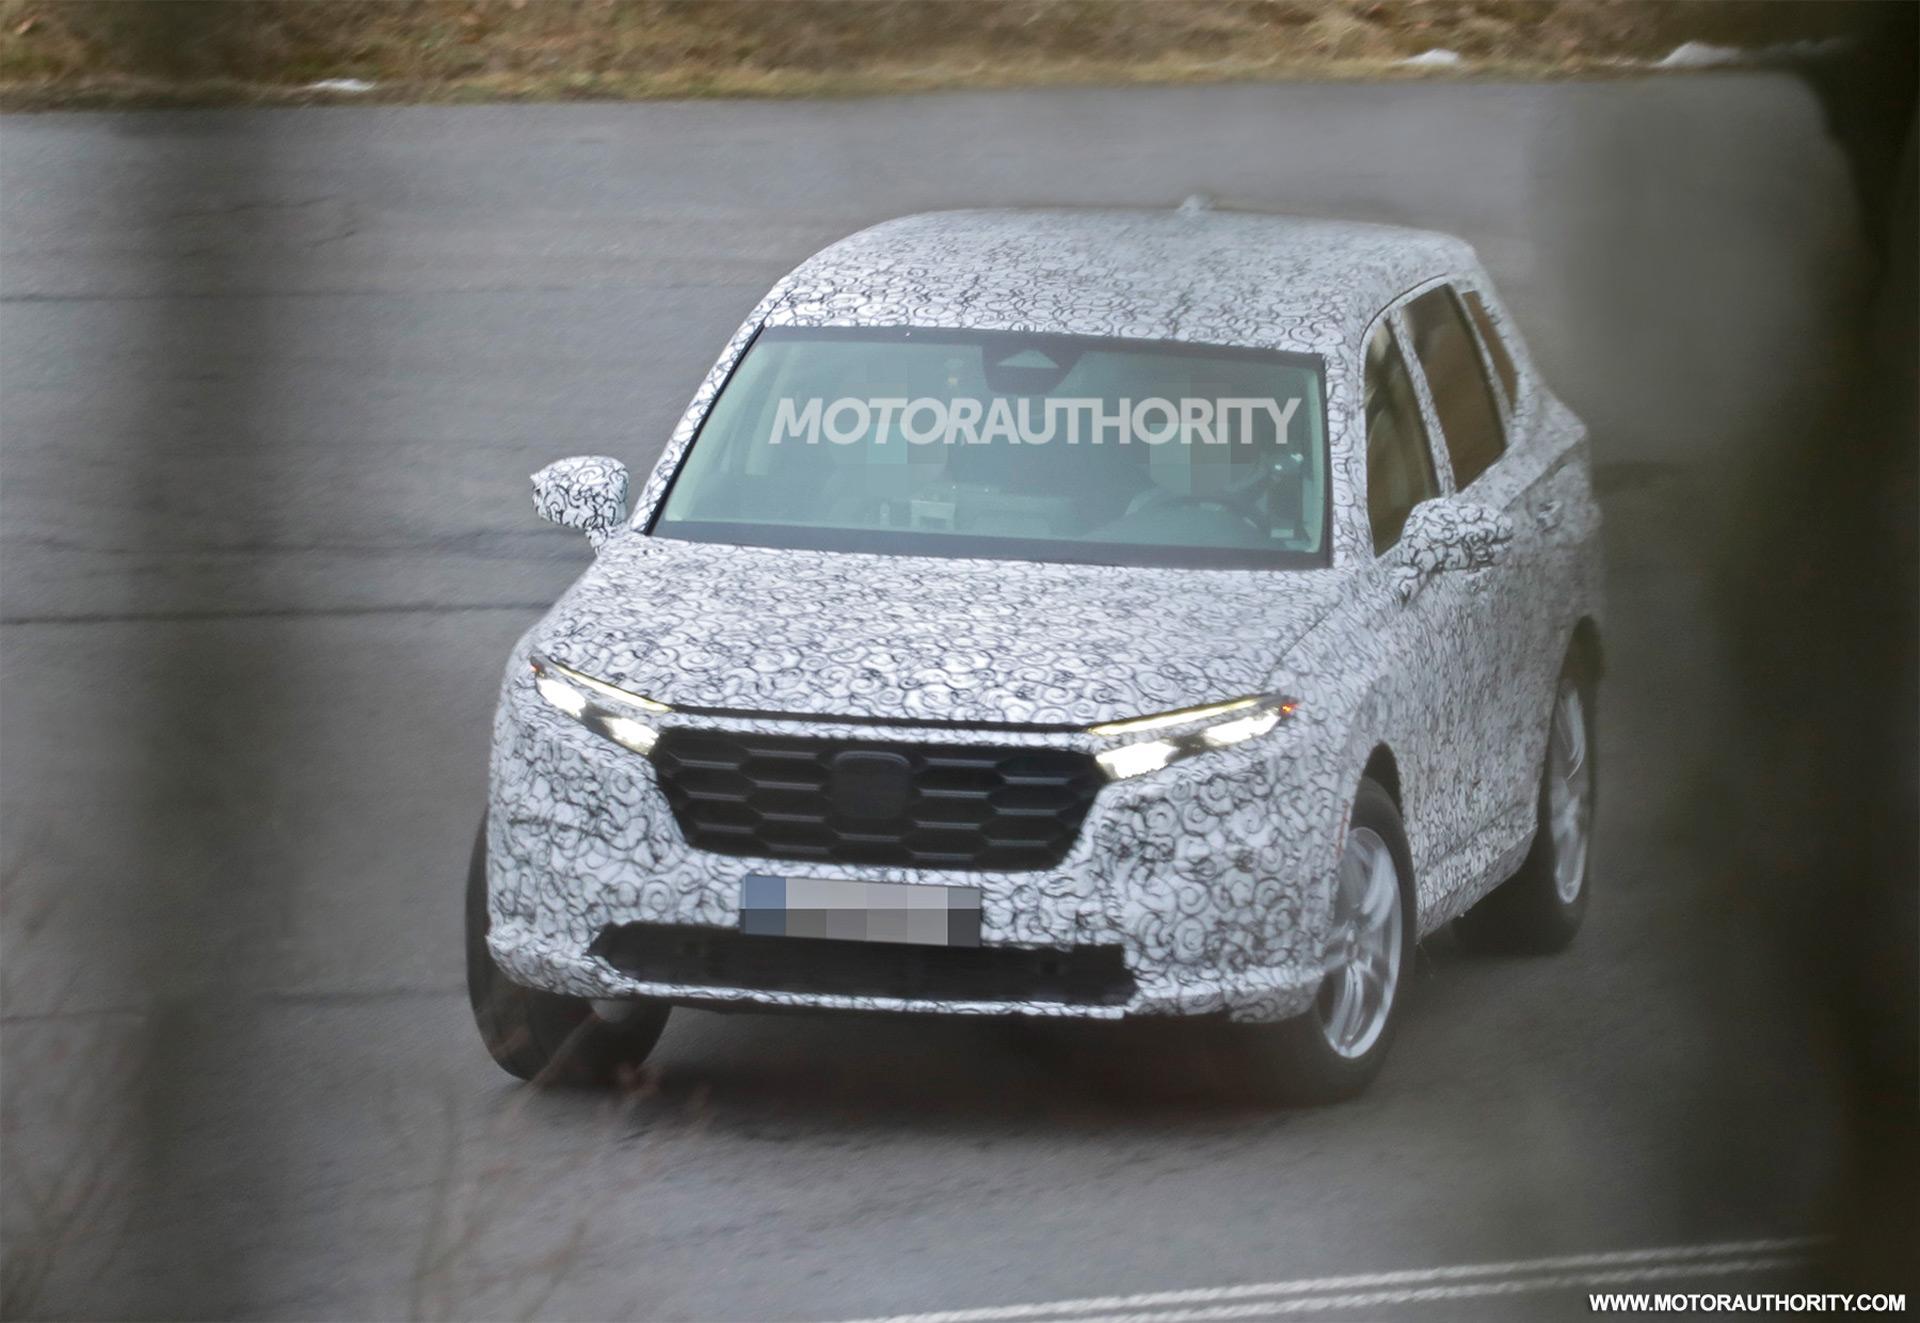 2022 Honda CR-V spy shots: Redesign coming for popular crossover